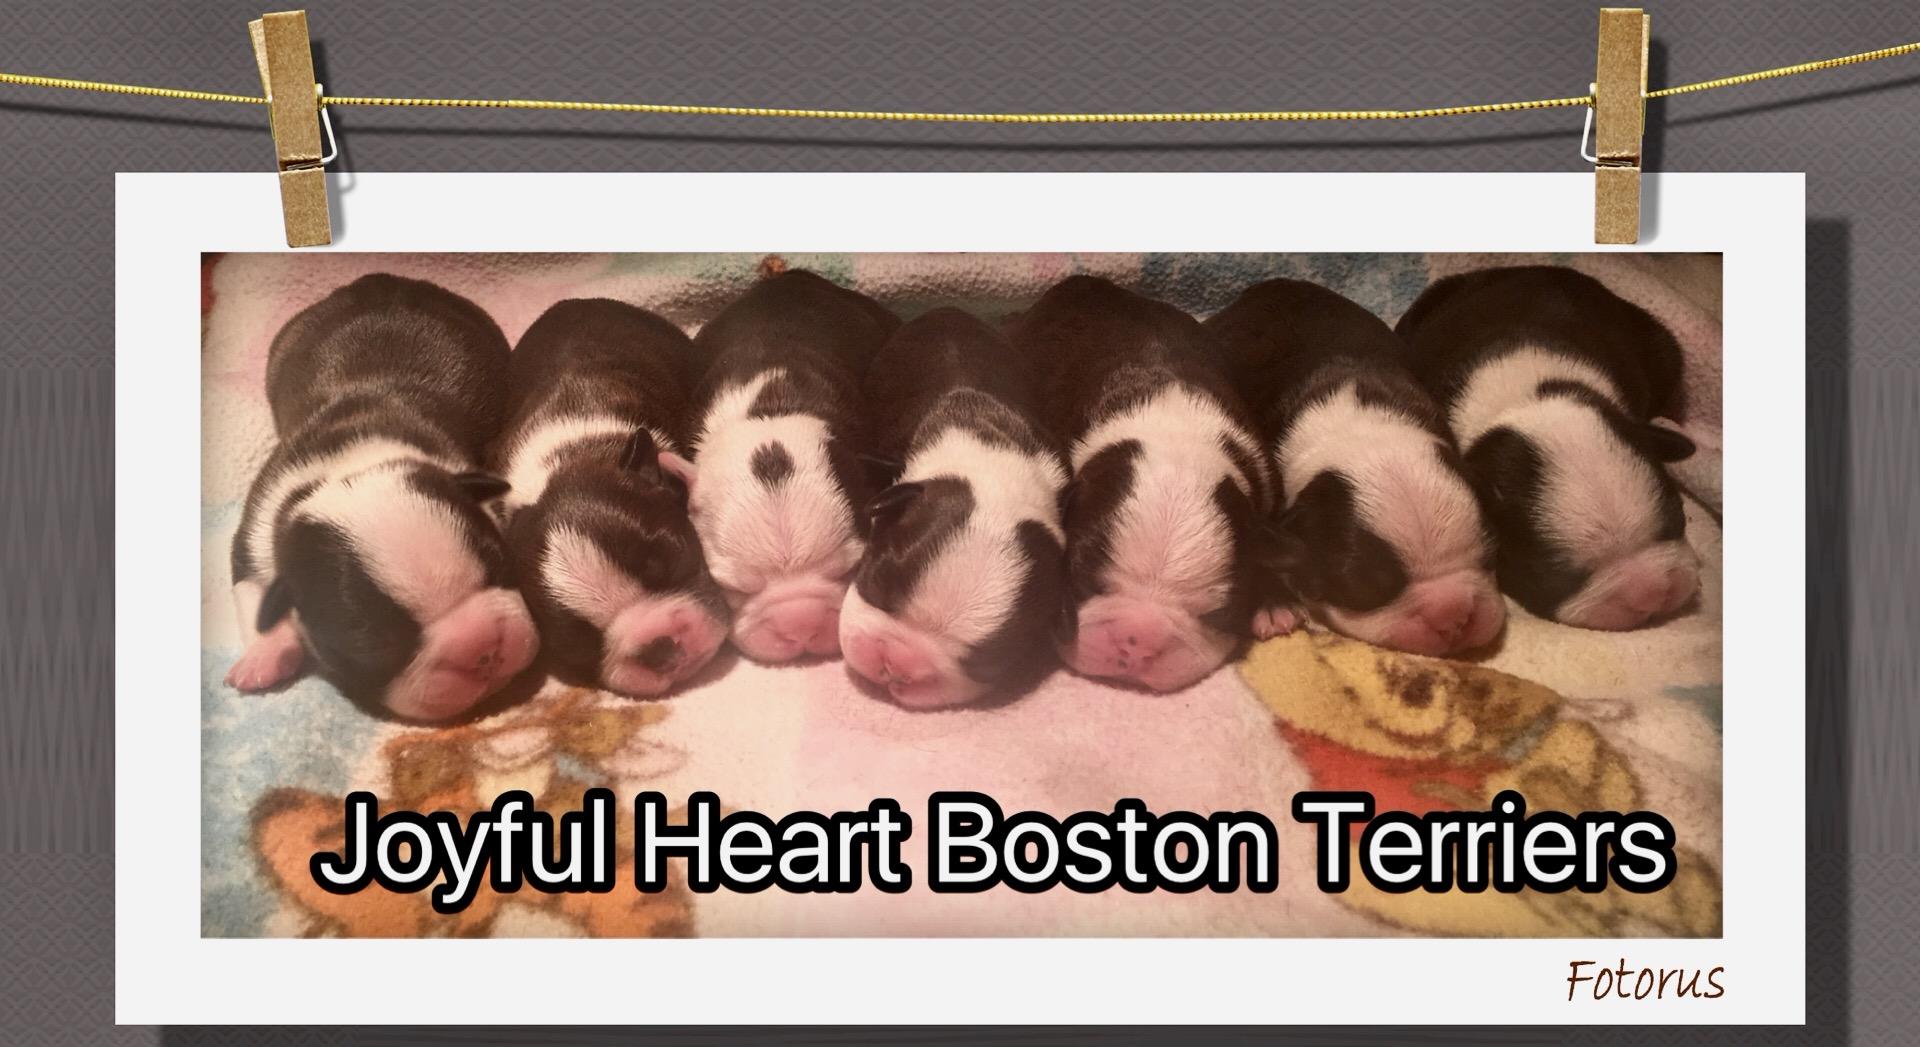 Joyful Heart Boston Terrier Logo